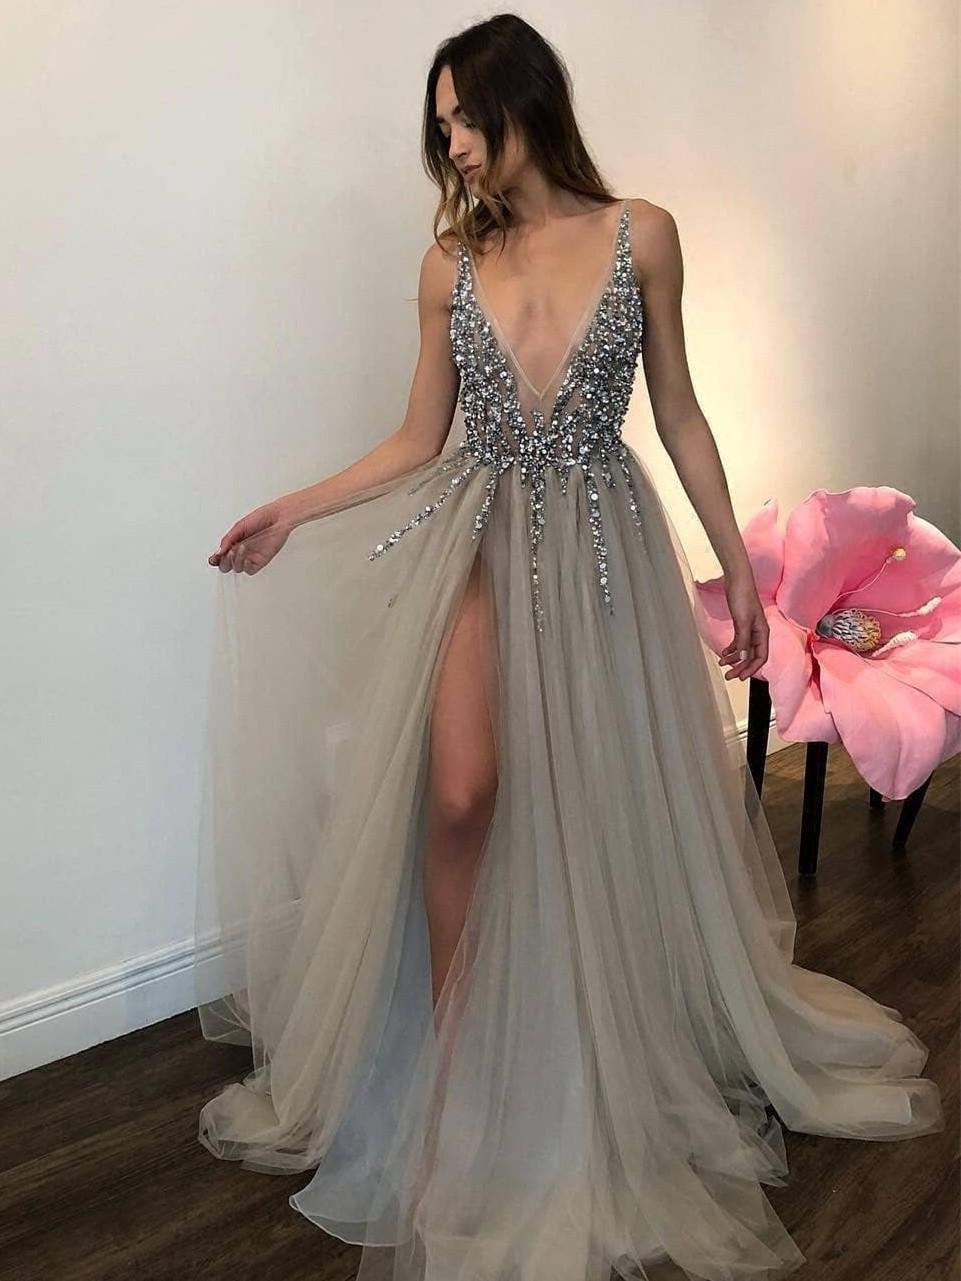 Nude V-Neck Long Beaded Prom Dress by Shail K